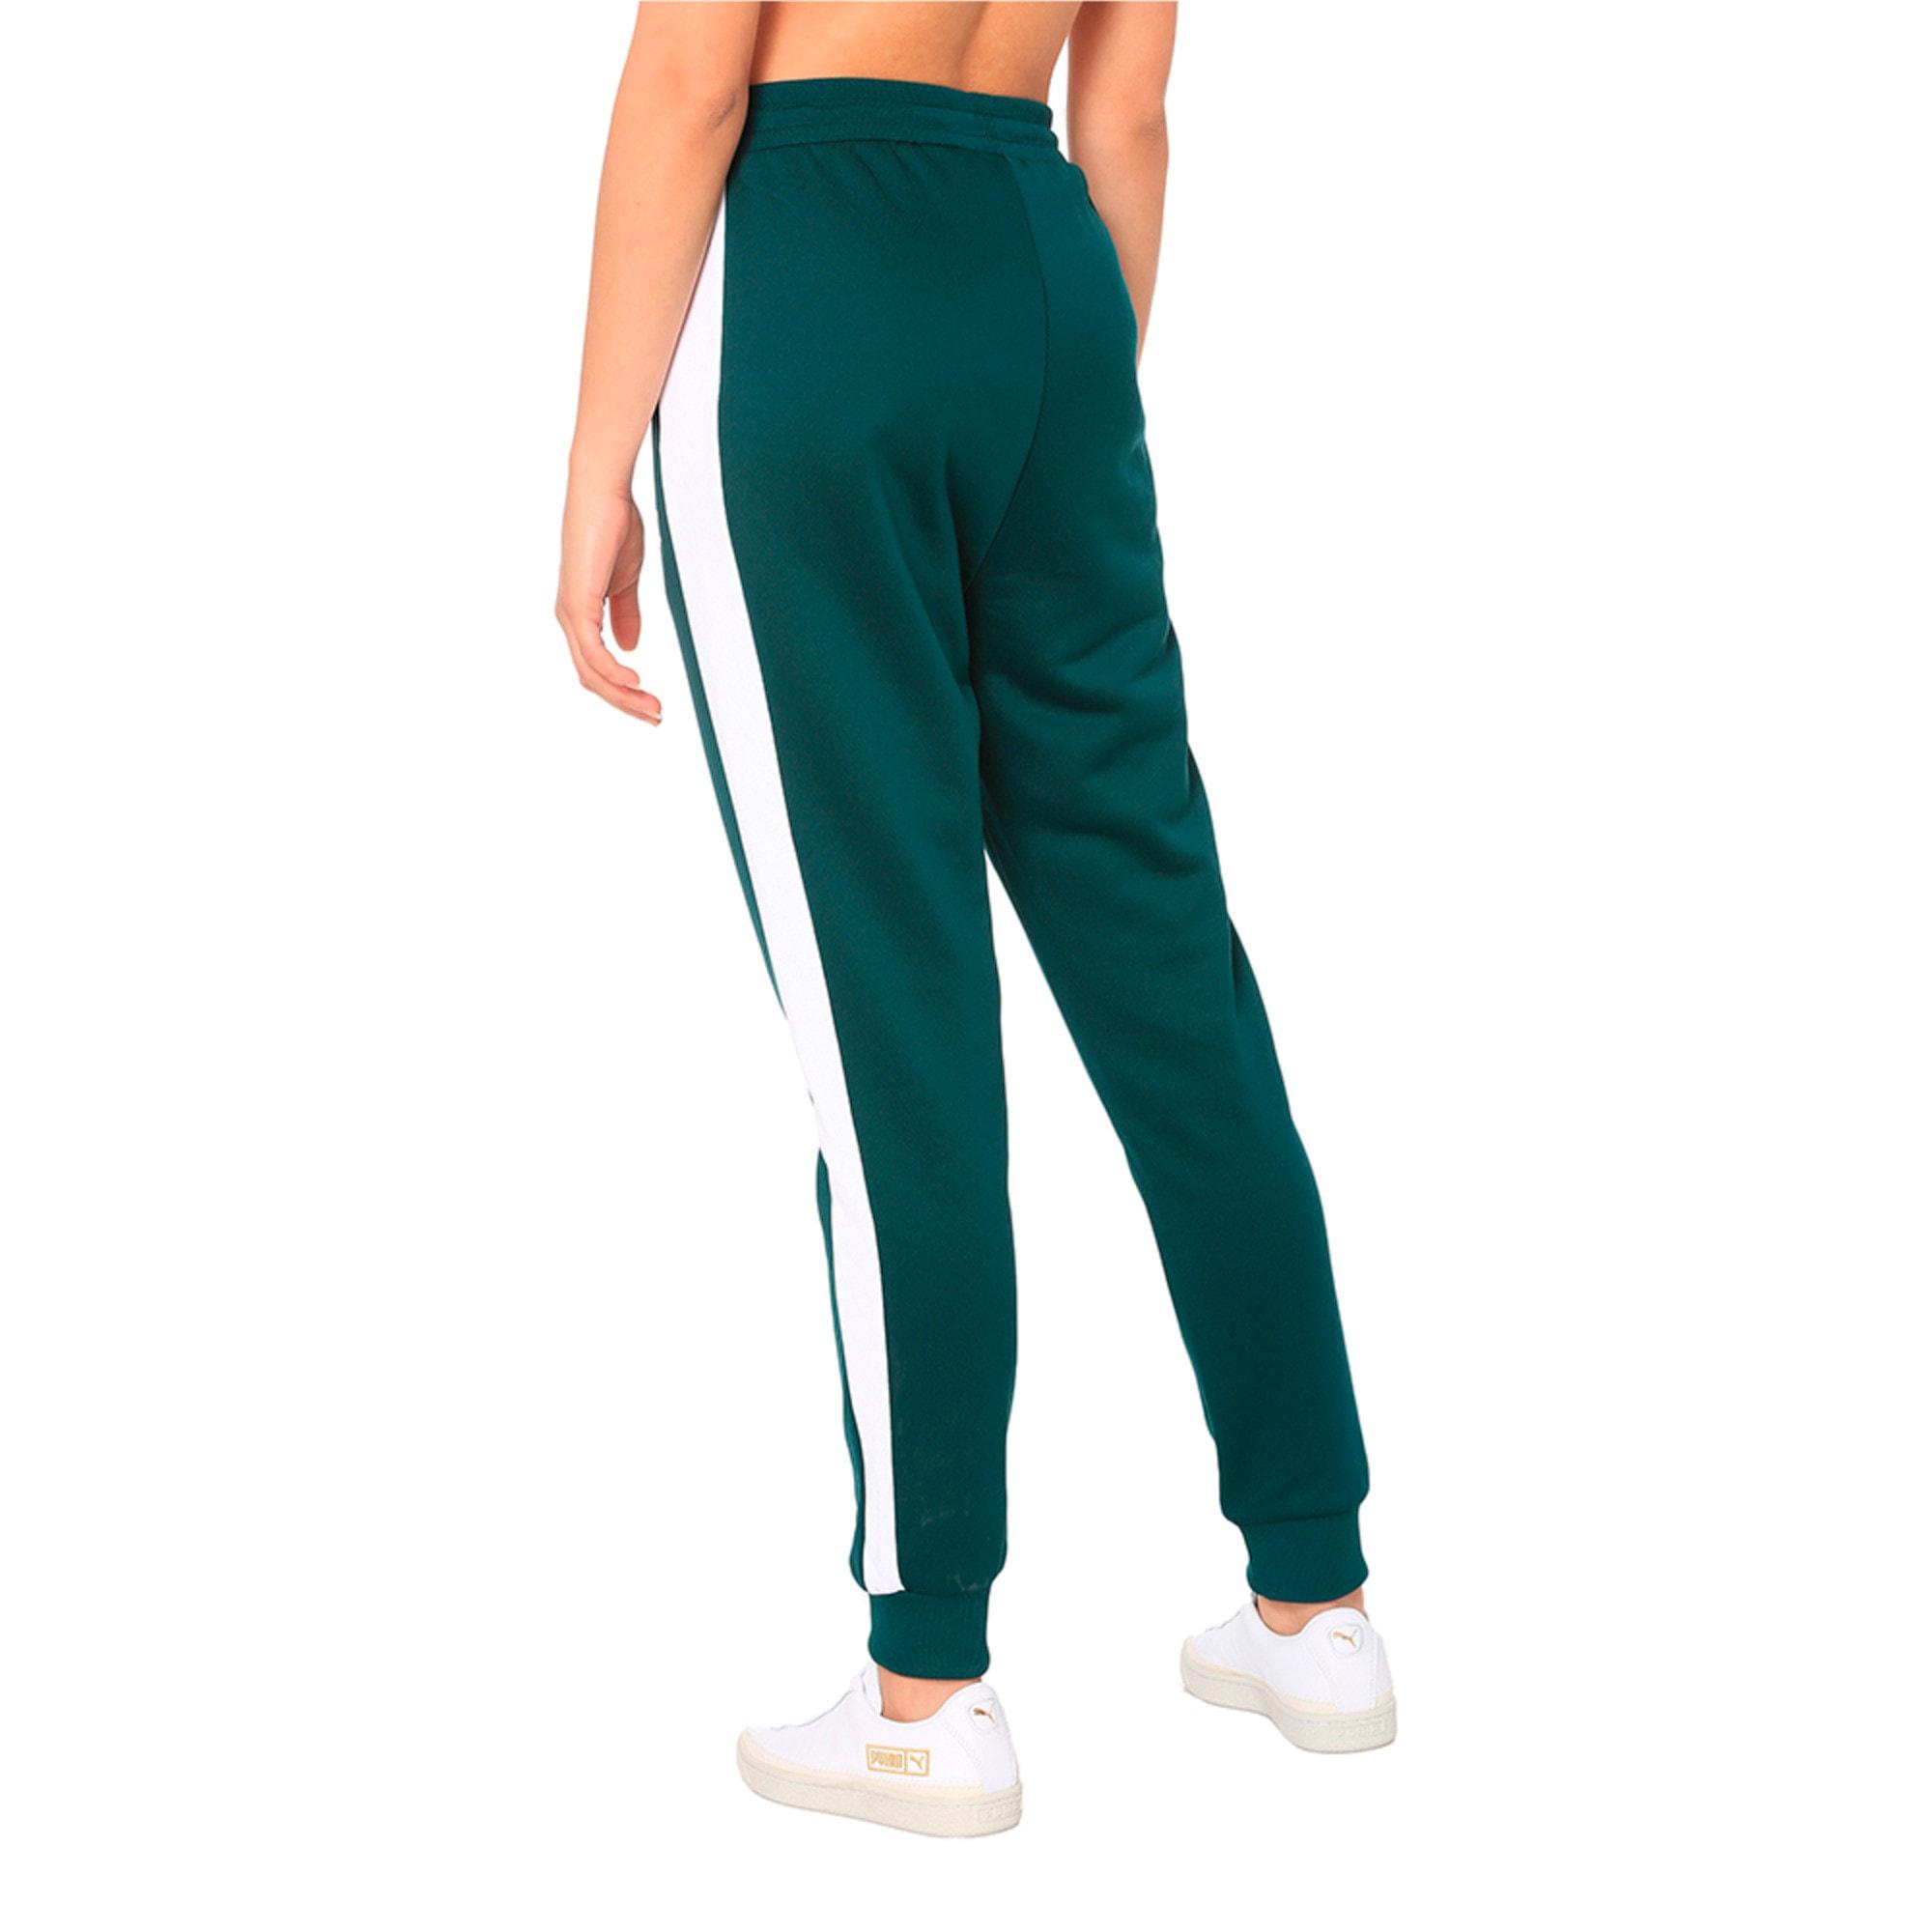 Thumbnail 2 of Classics T7 Knitted Women's Track Pants, Ponderosa Pine, medium-IND